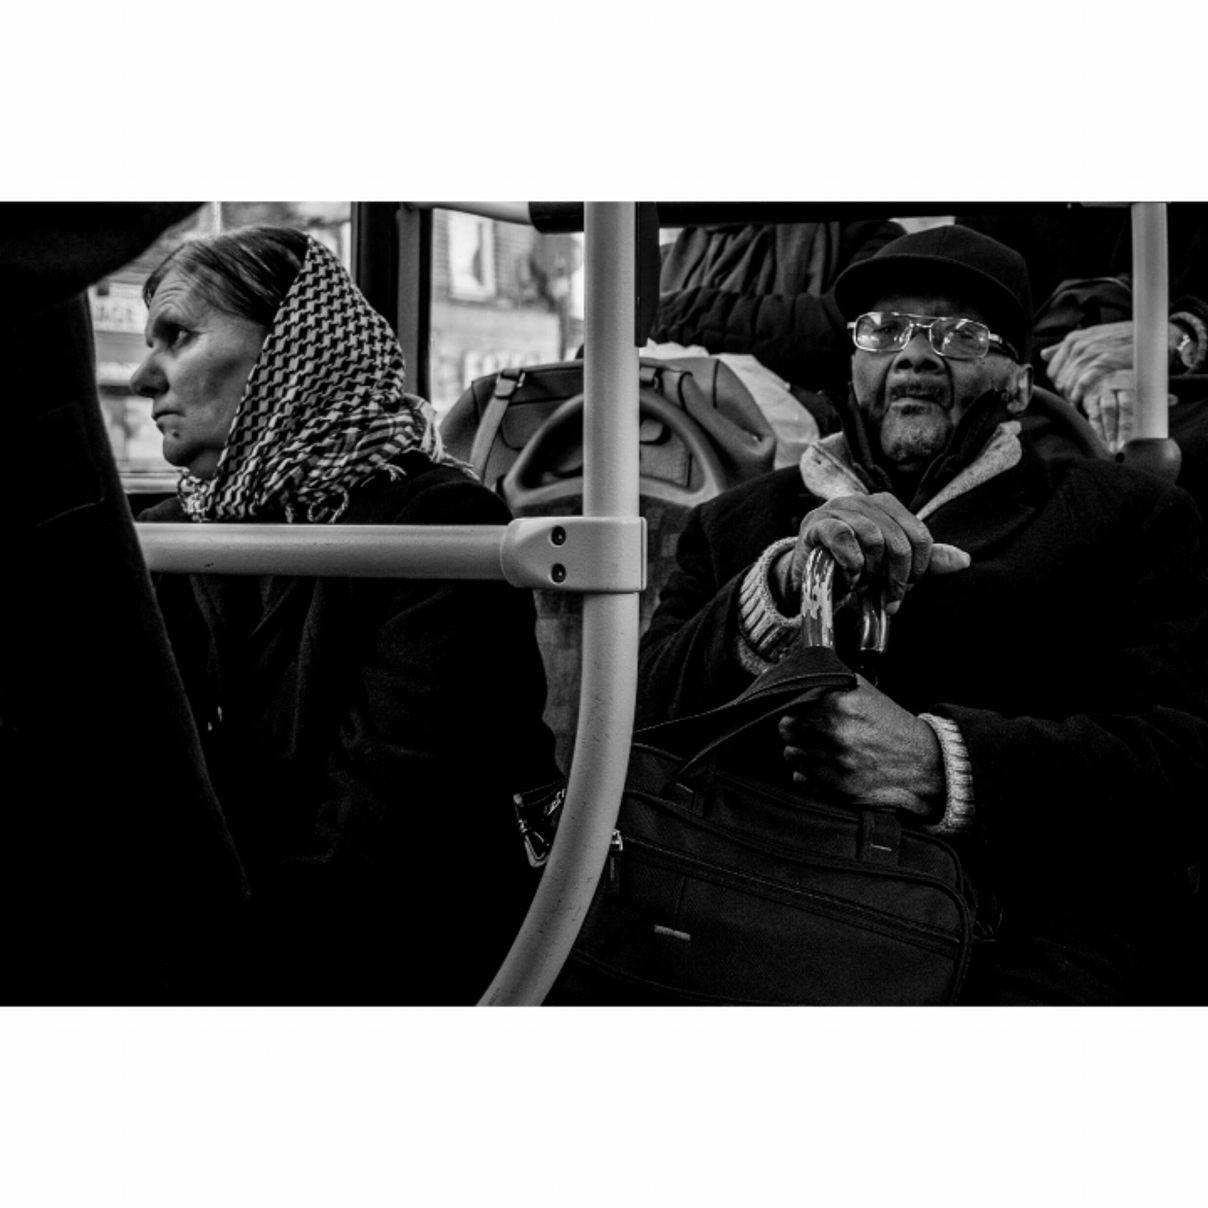 Commuting, London - January 2017